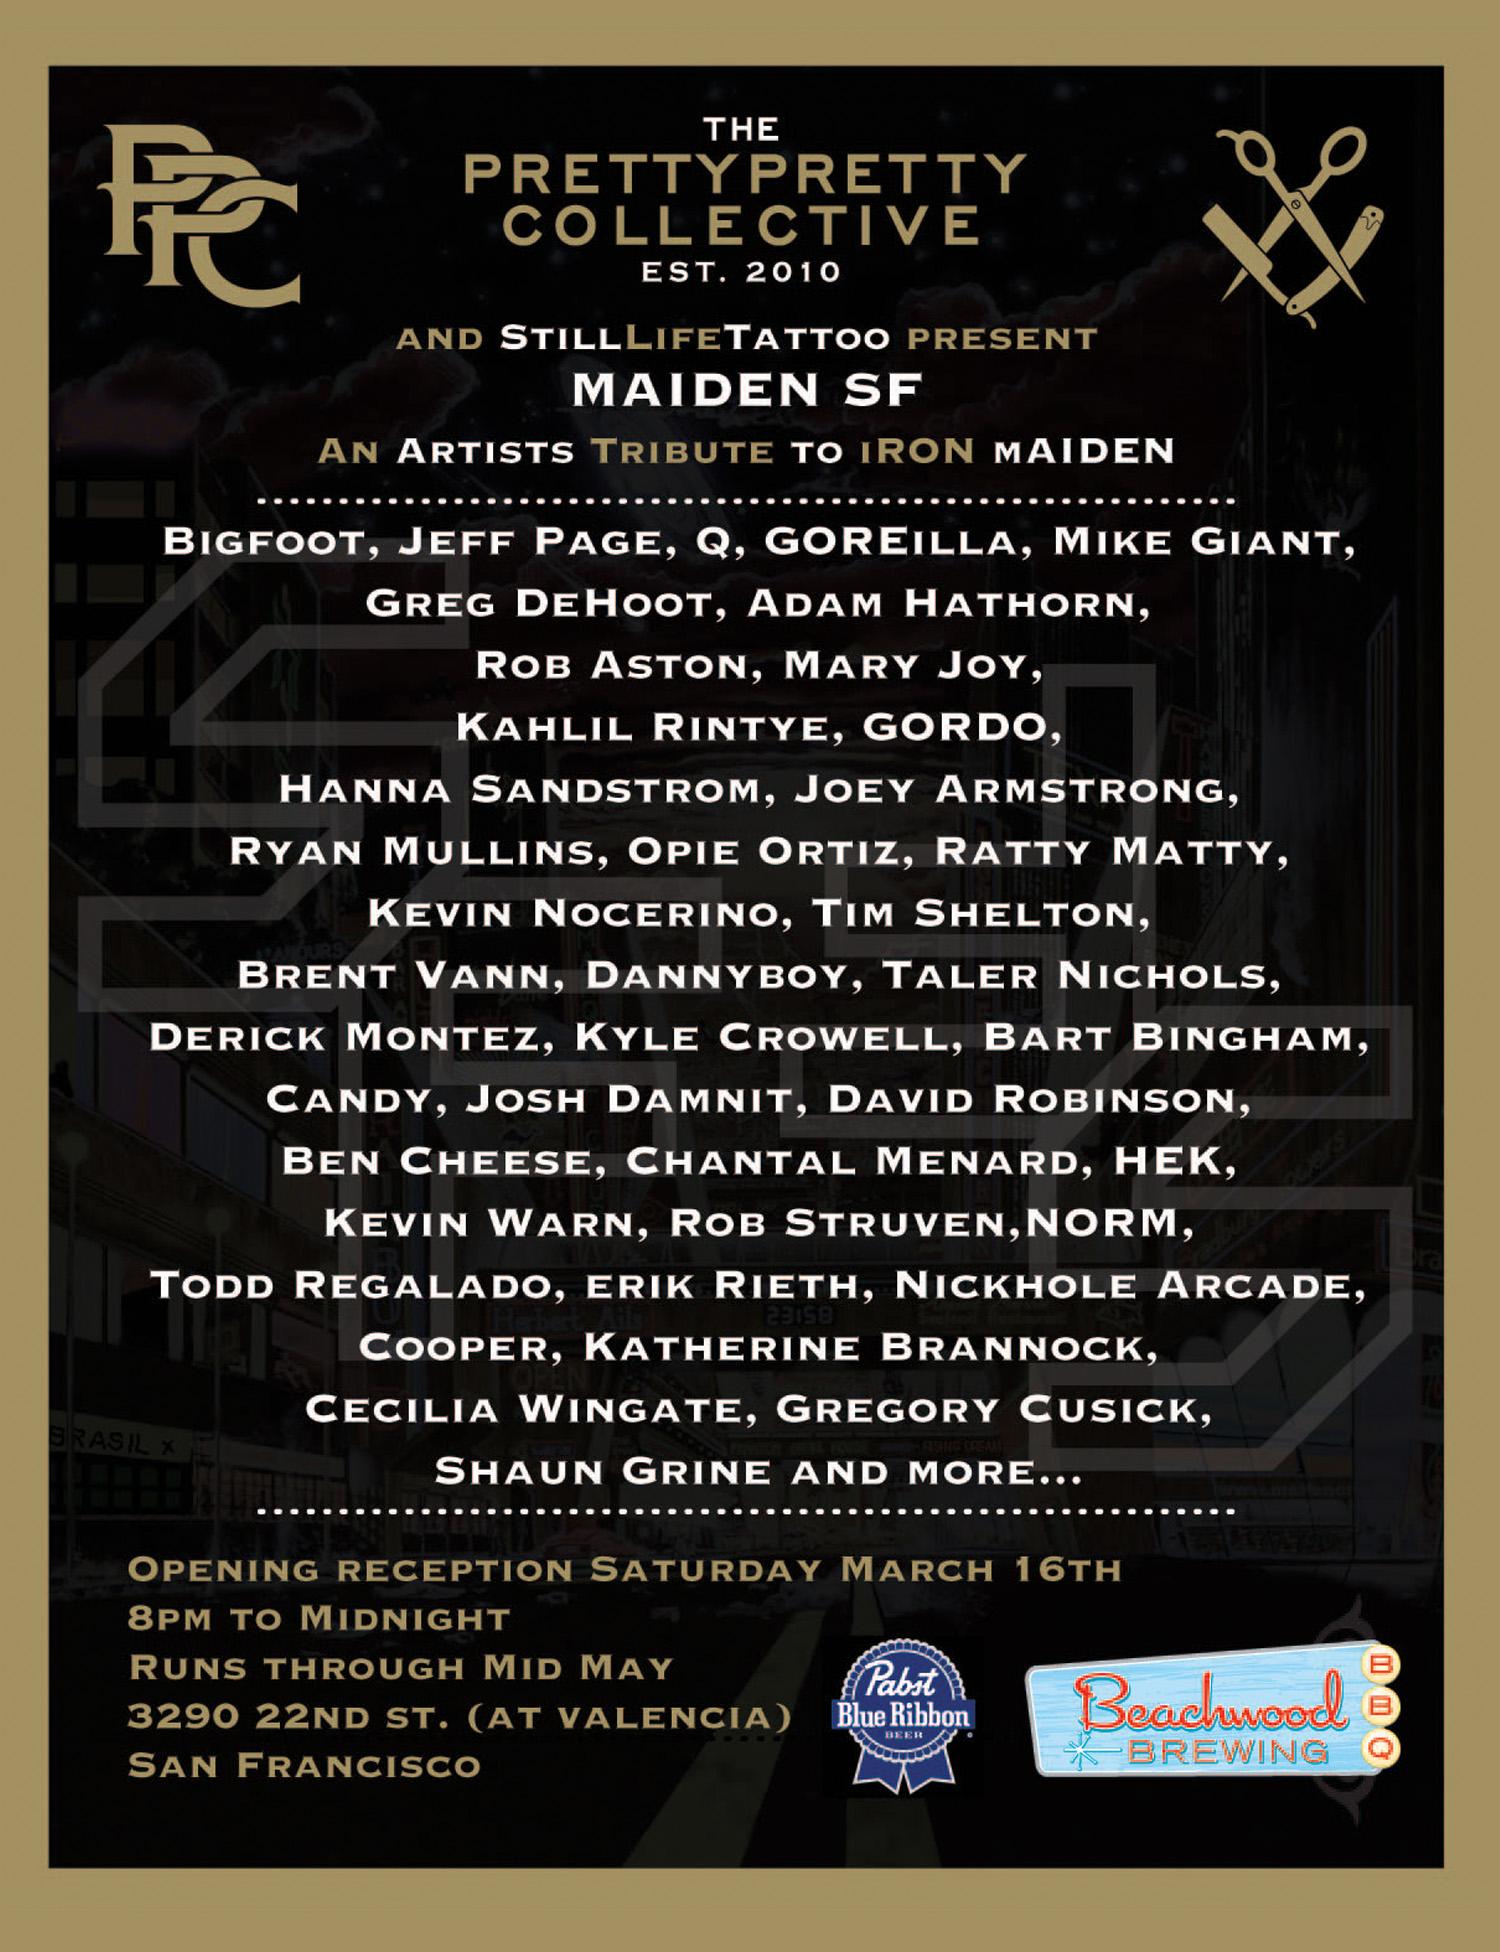 Maiden SF/ Iron Maiden Group Show